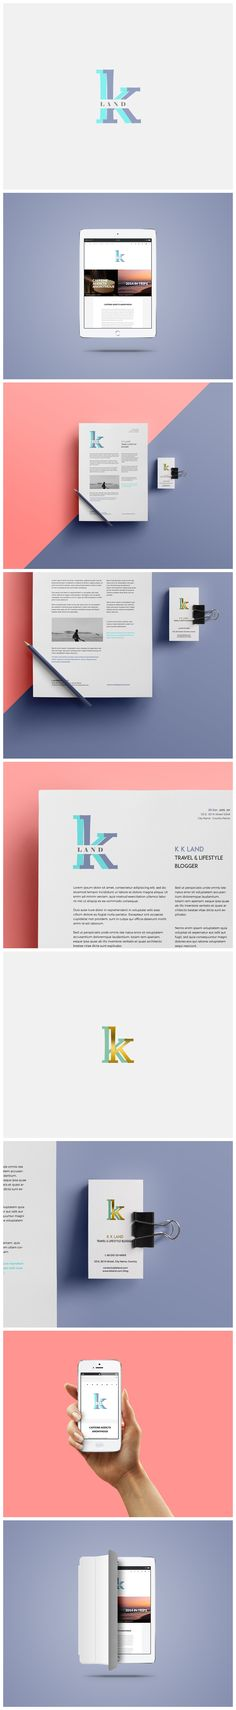 KK Land - website and #stationery design for a lifestyle blogger